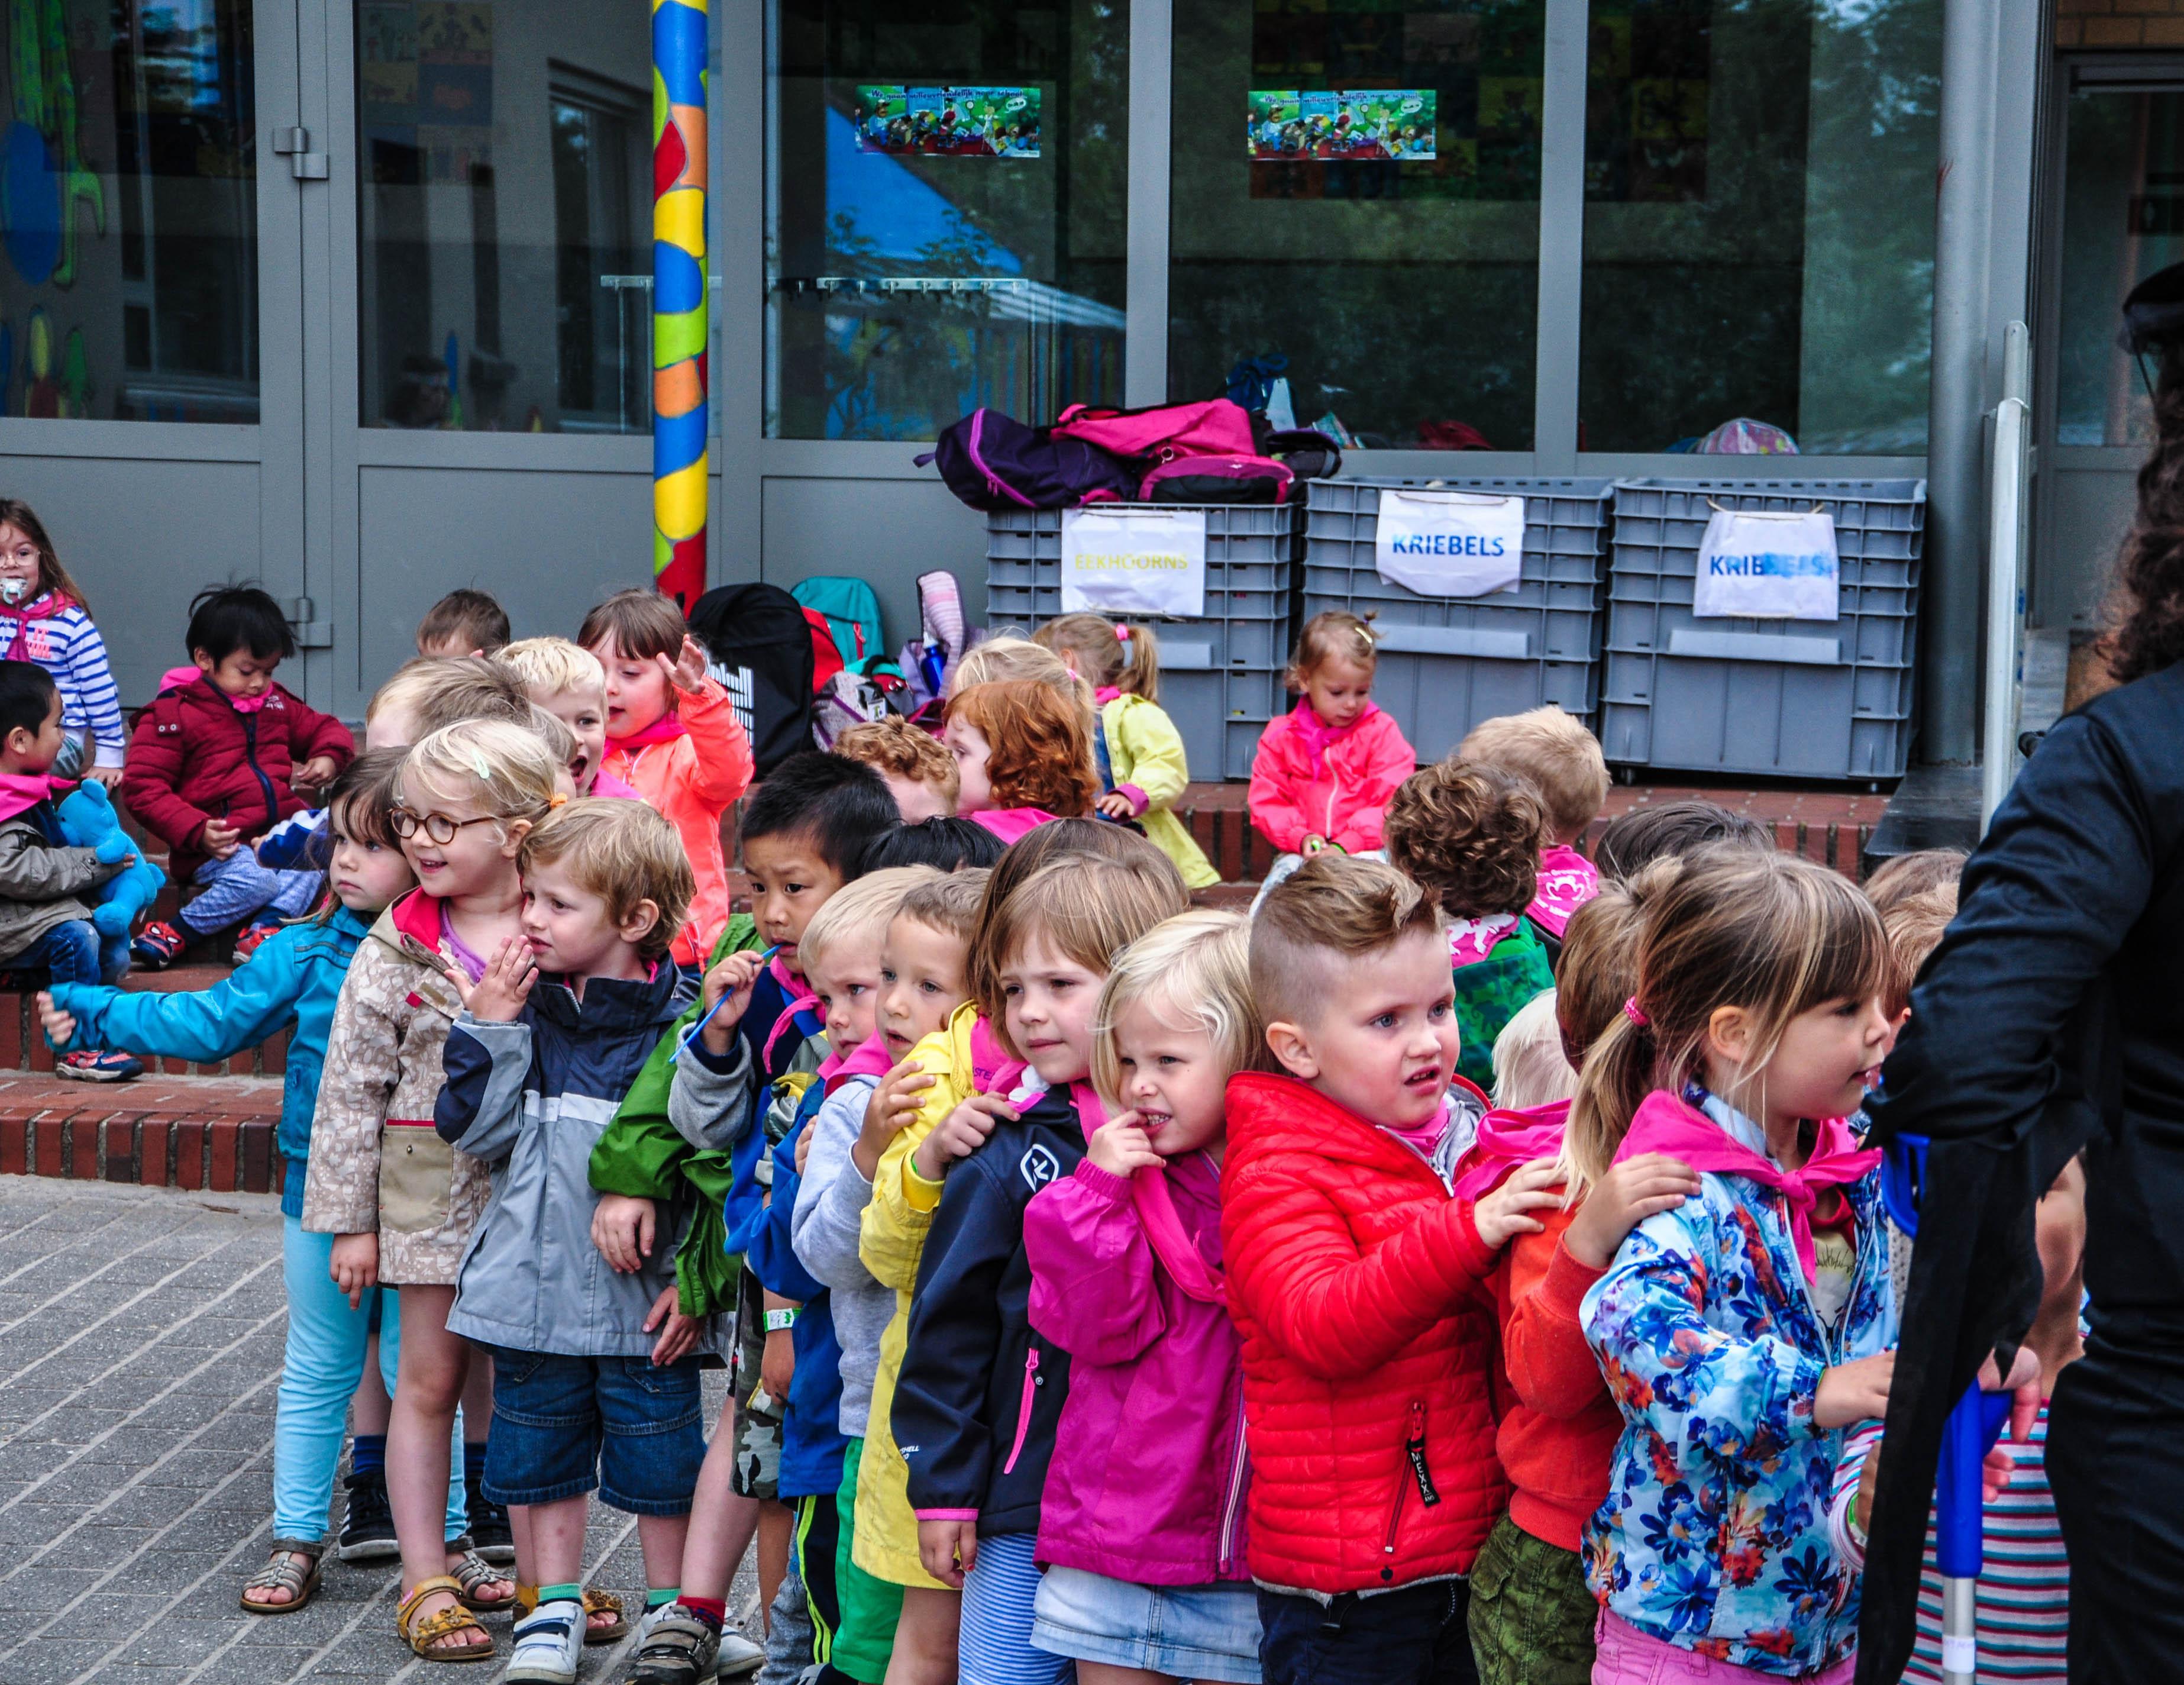 Biekes leeftijdsgroep speelplein Groene Zone Leuven